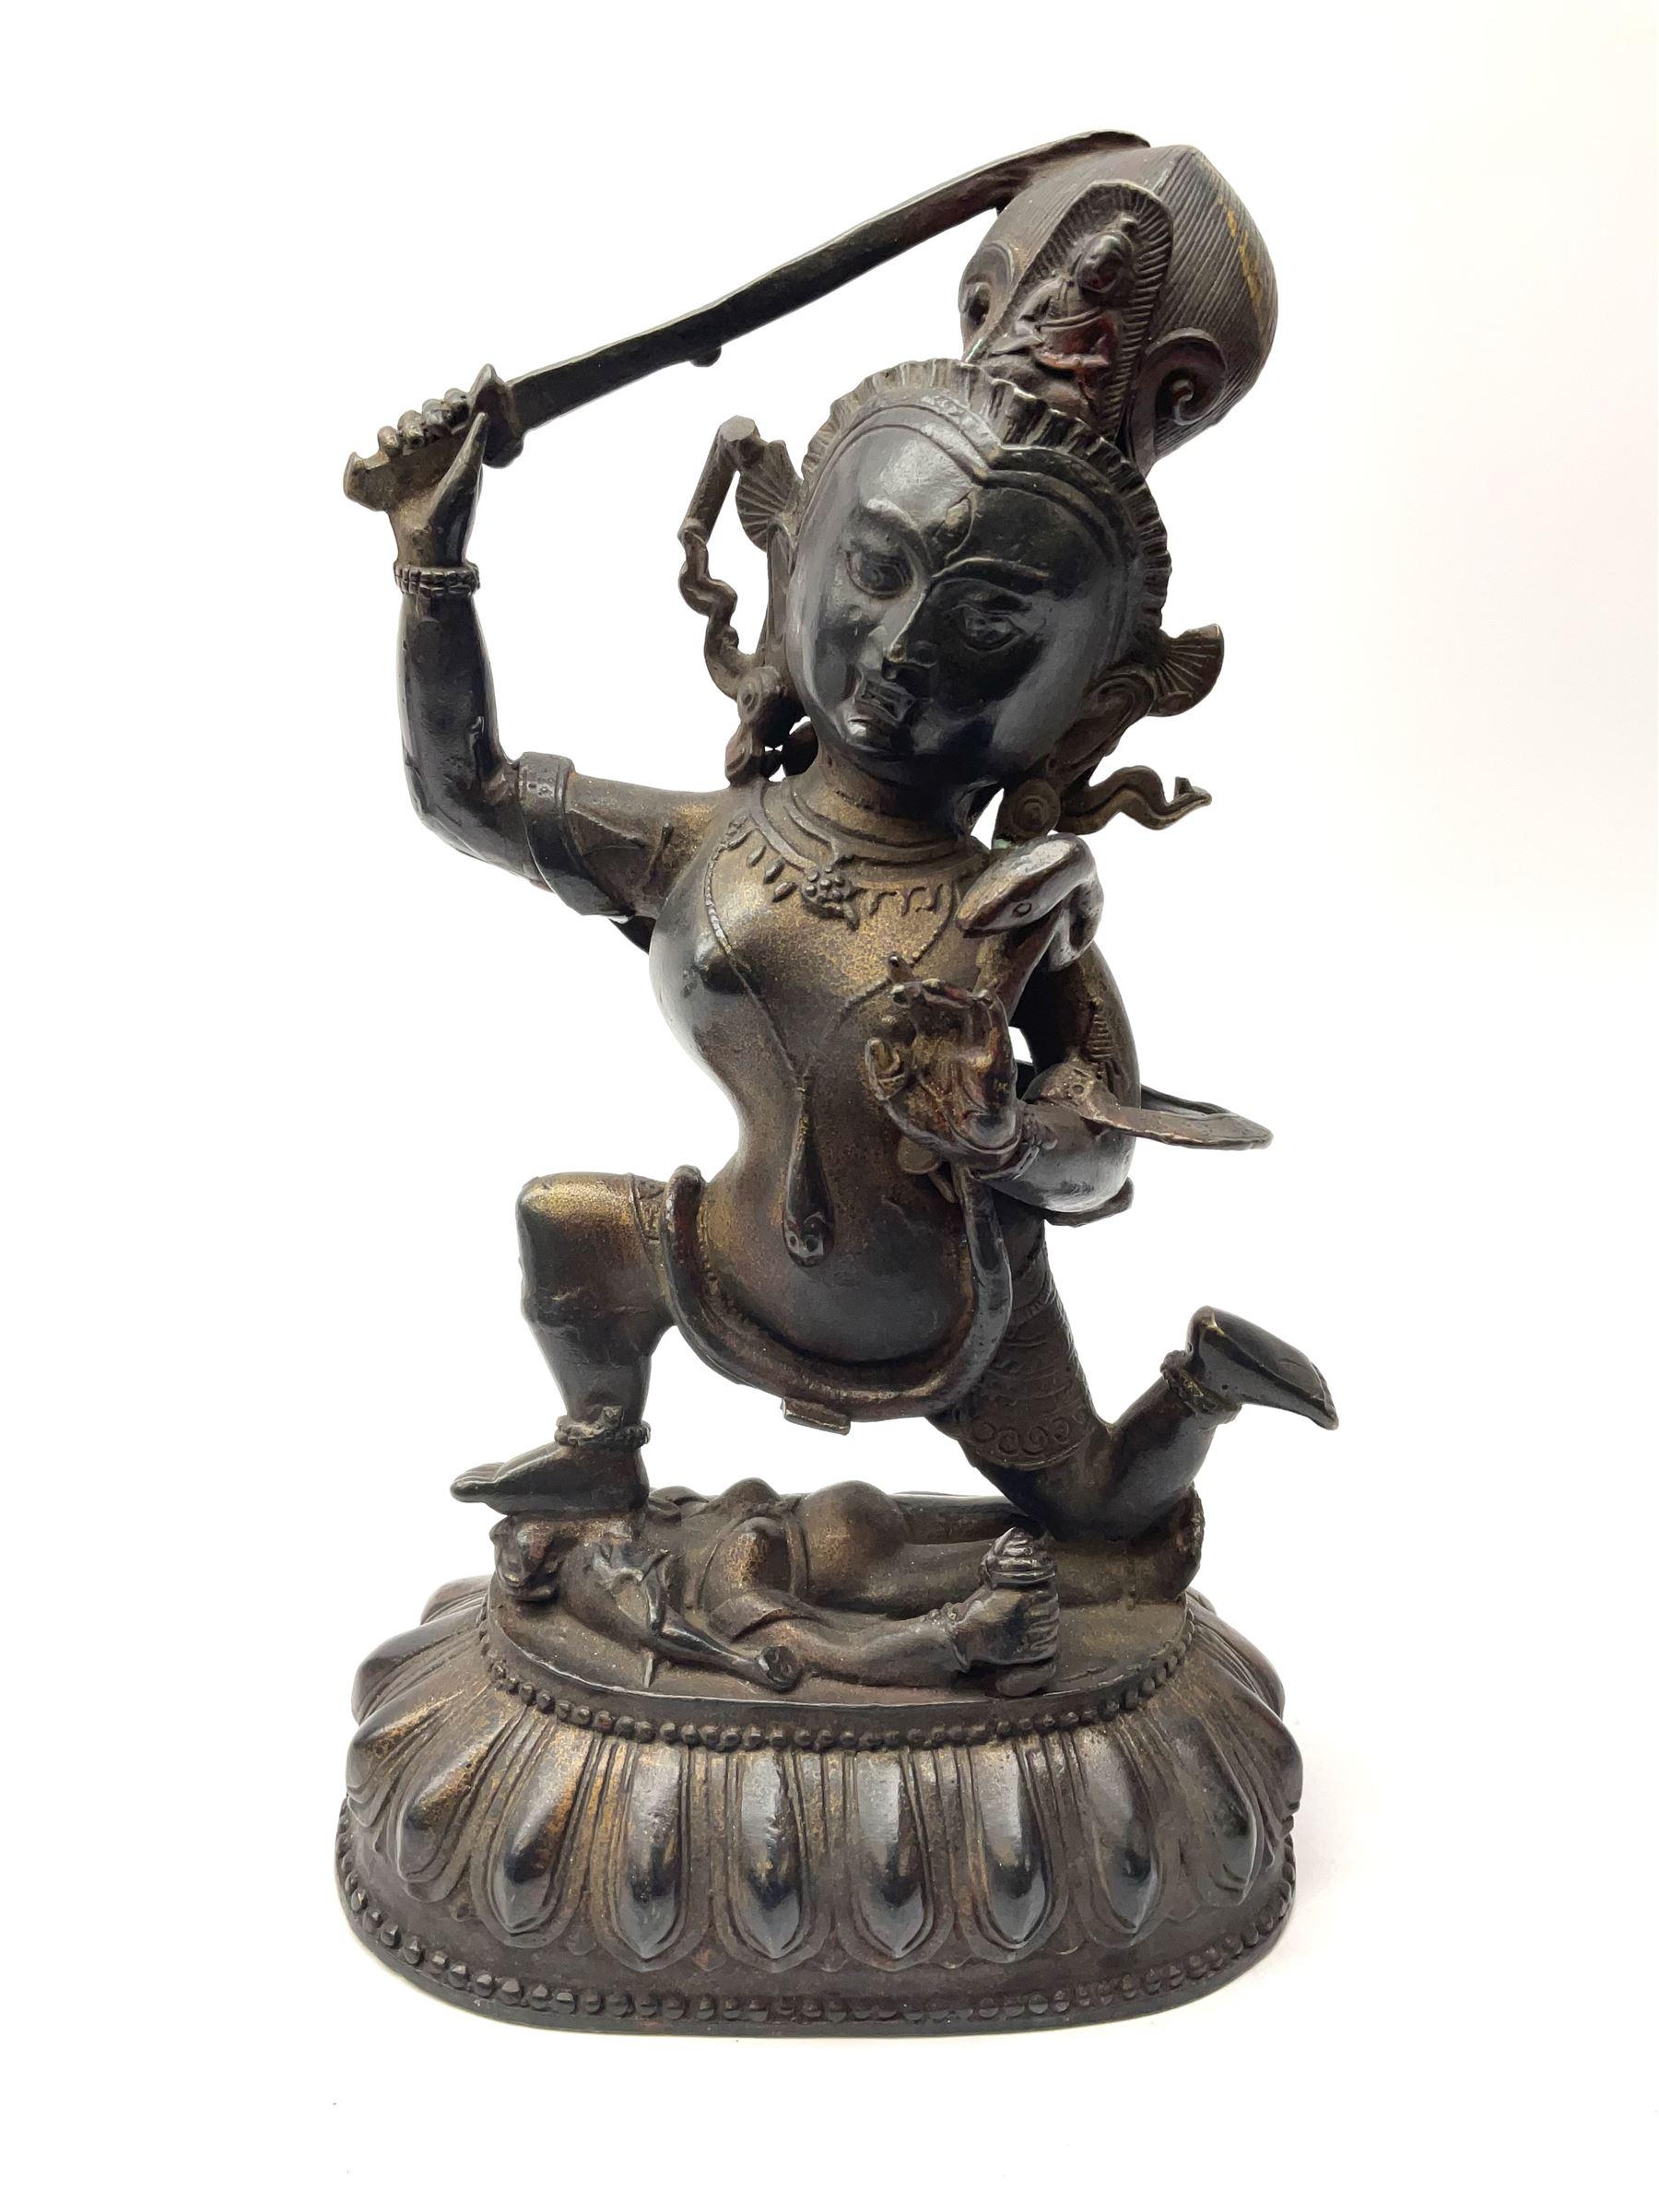 An eastern figure bronzed figure modelled as female deity kneeling upon figure